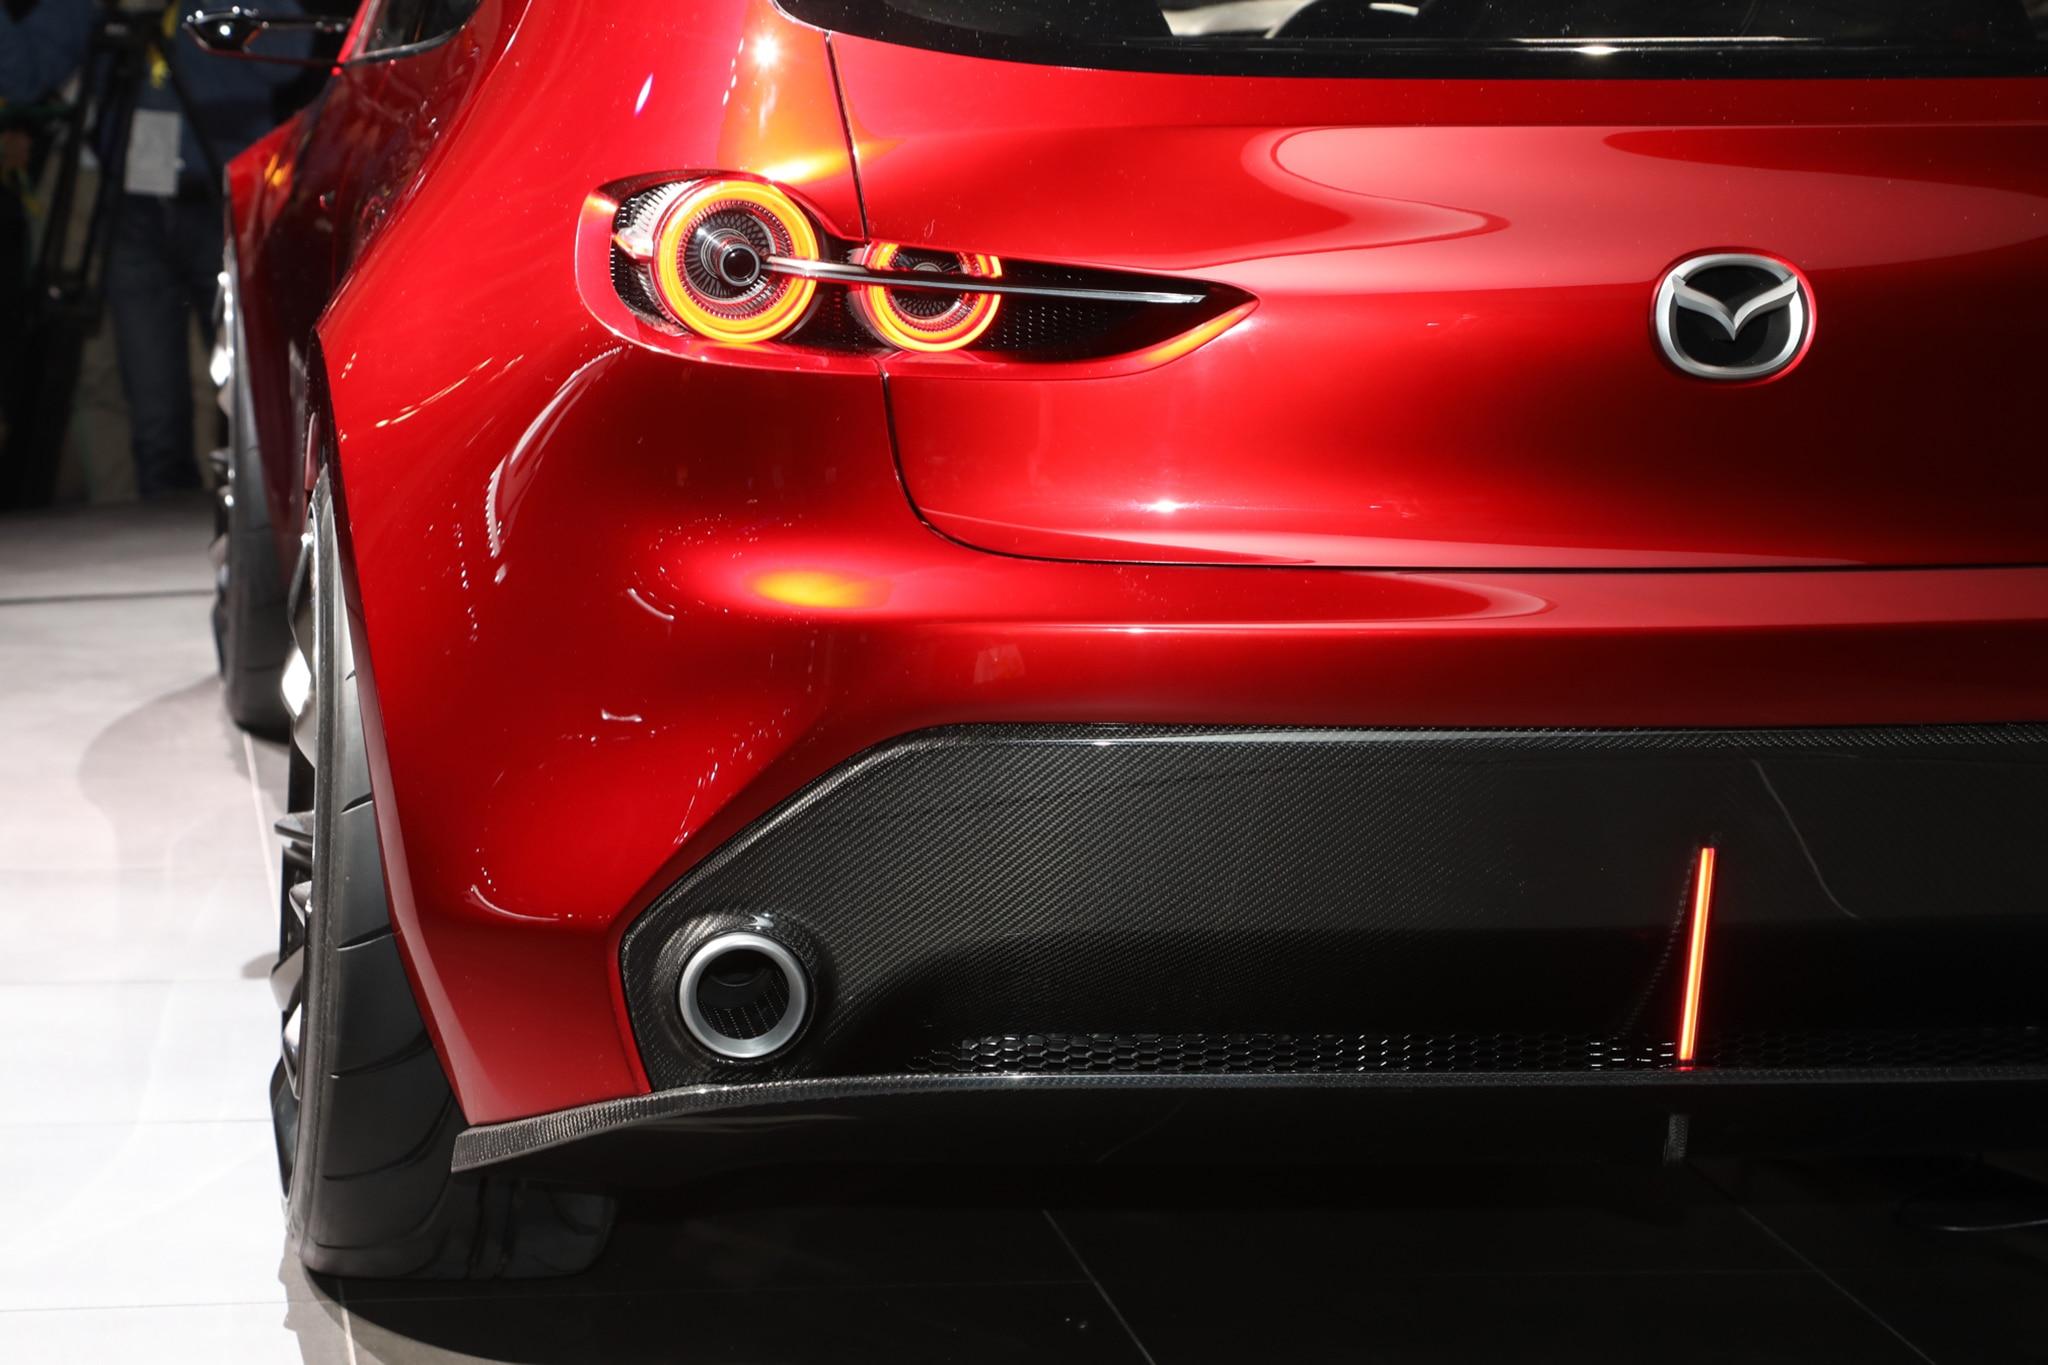 https://st.automobilemag.com/uploads/sites/11/2017/10/Mazda-Kai-concept-tail-light.jpg